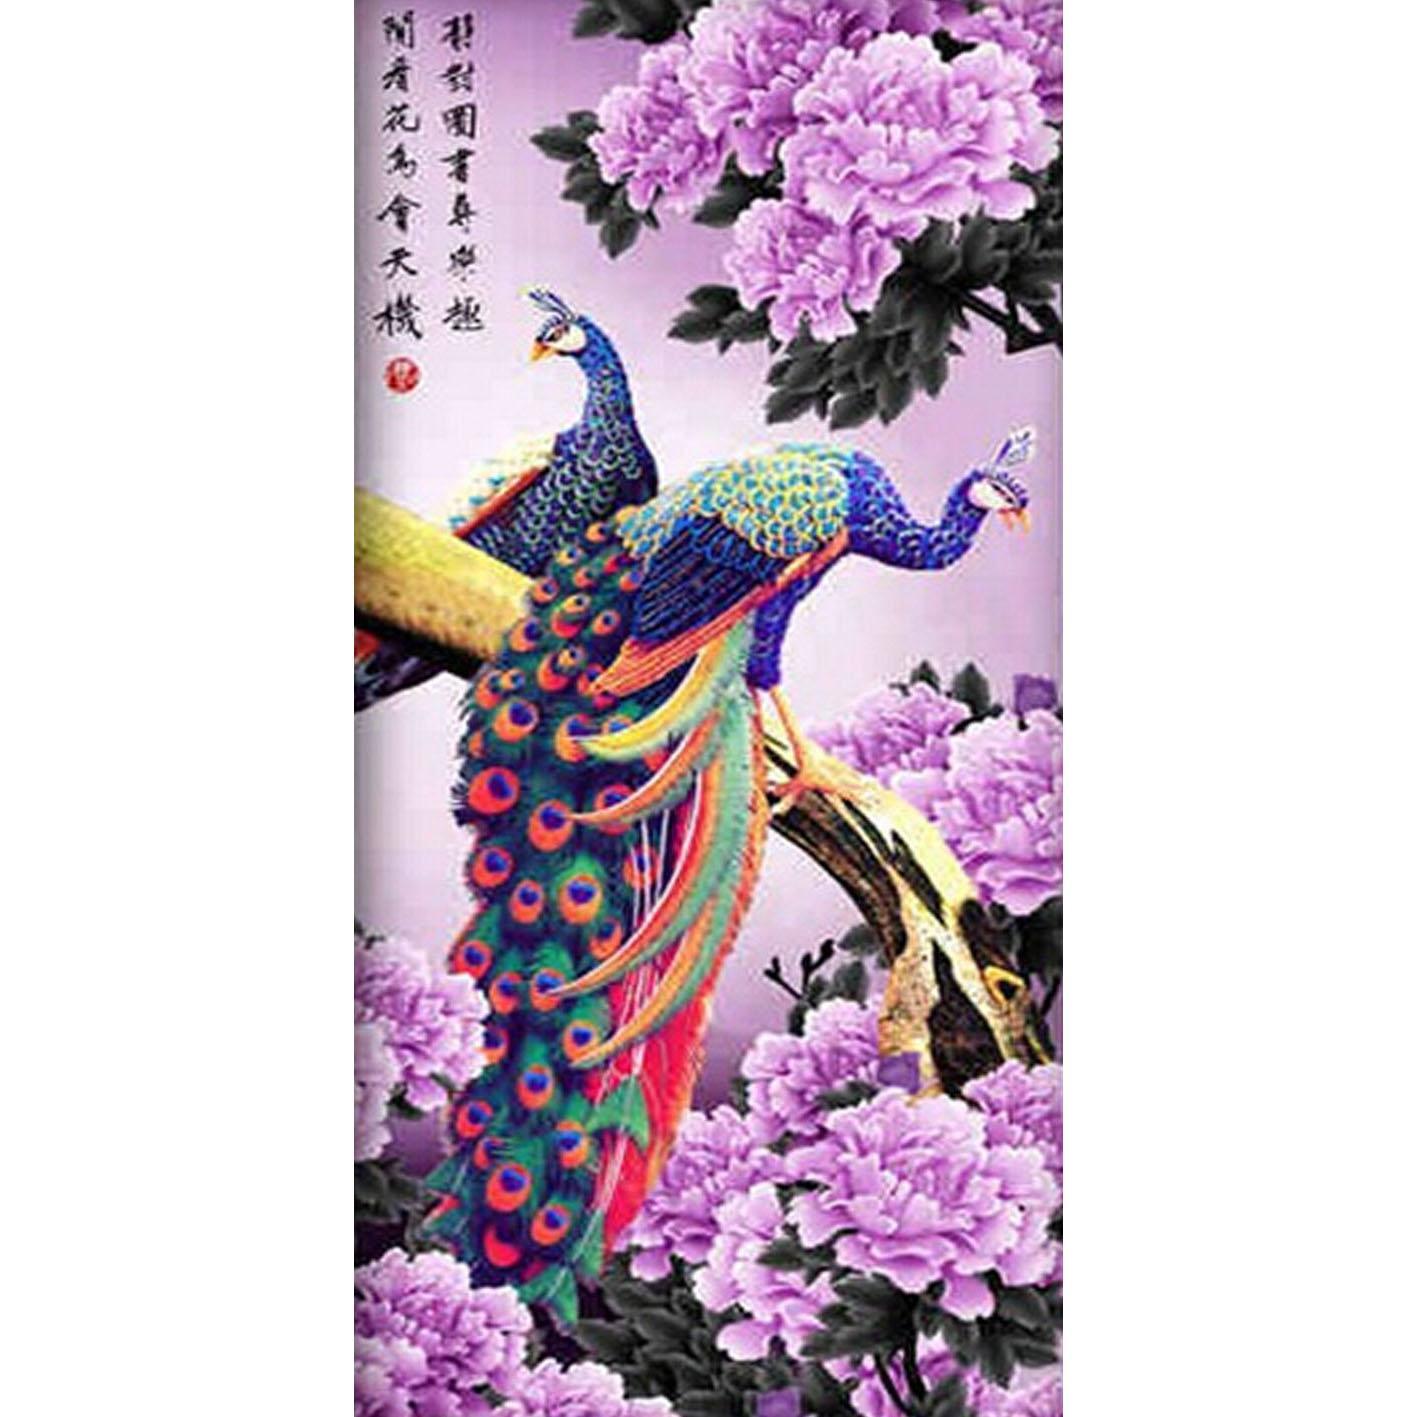 2019 Diamond Embroidery Animal Peacock Pattern Pictures Diy Diamond